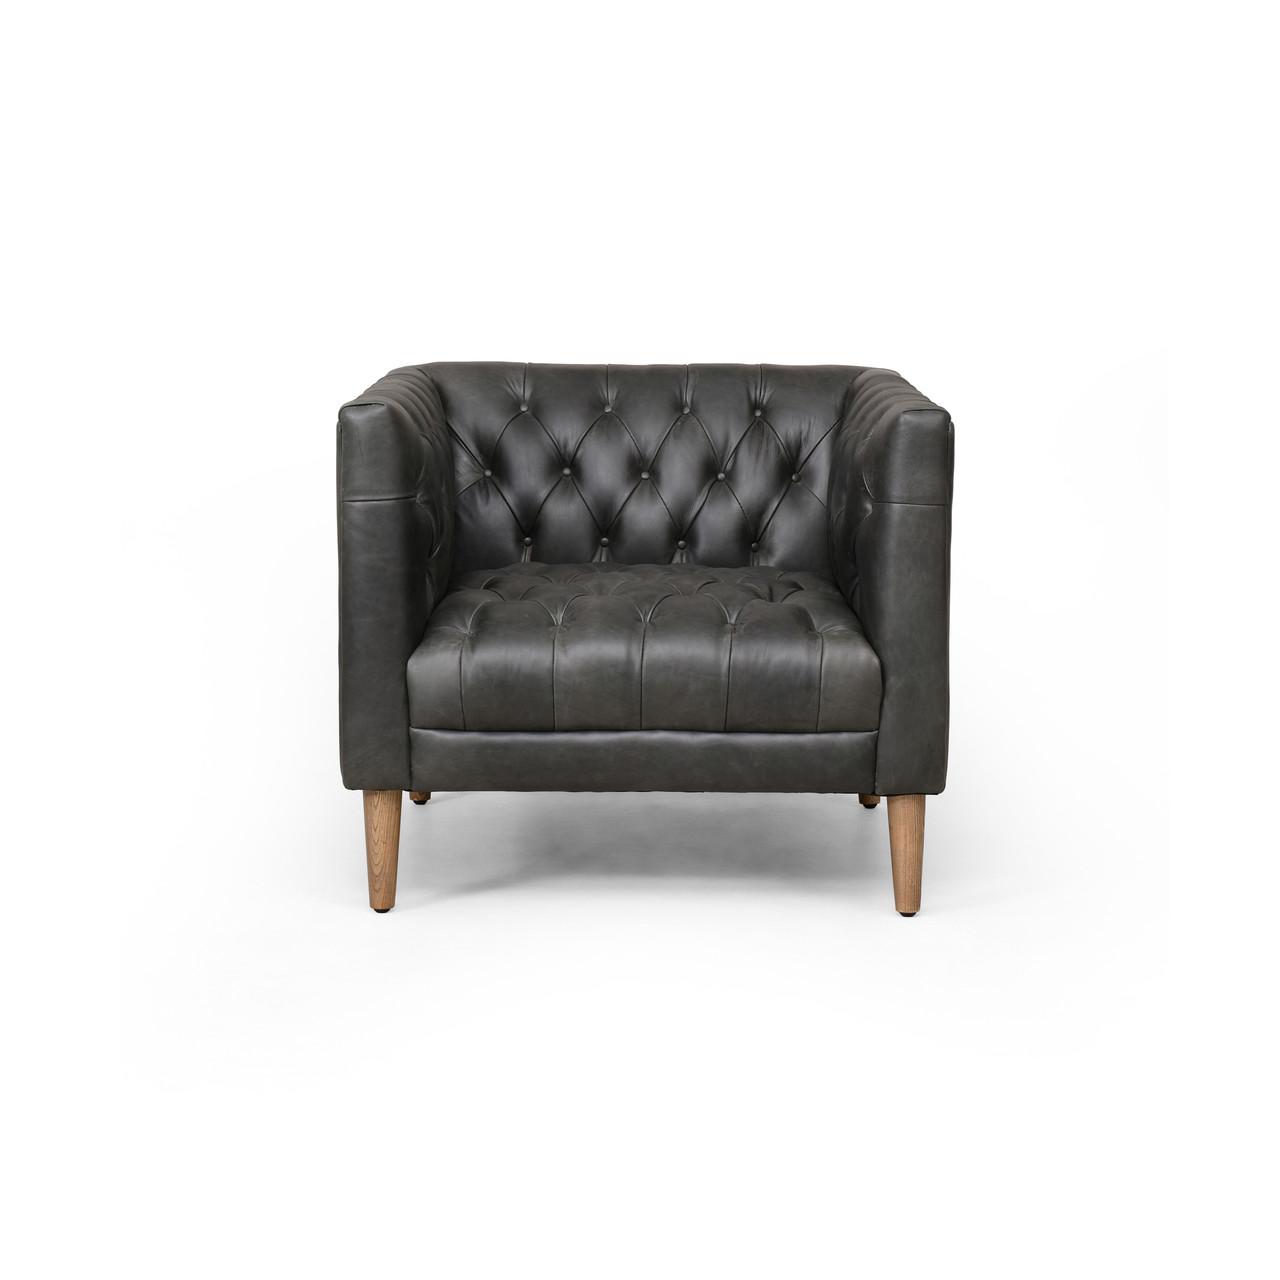 Devon Leather Chair - NW Ebony